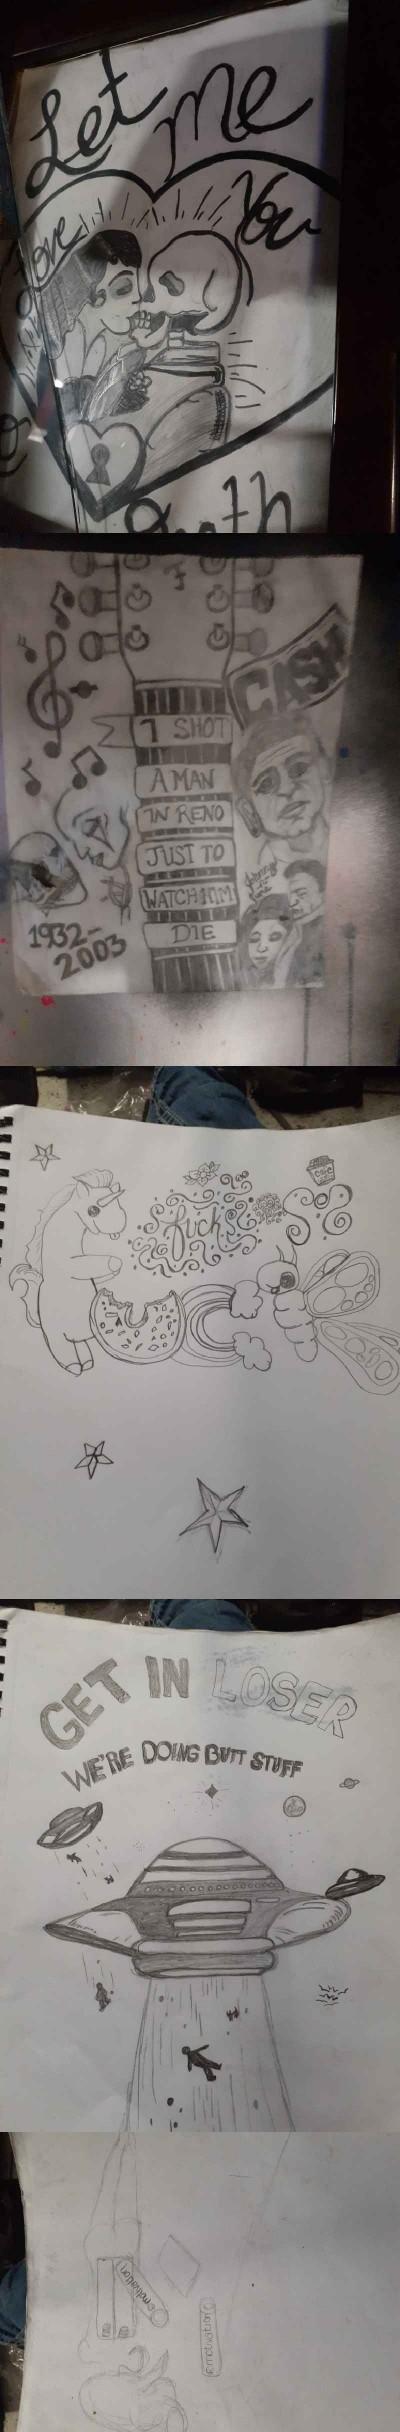 Doodle Digital Drawing | AmandaM | PENUP